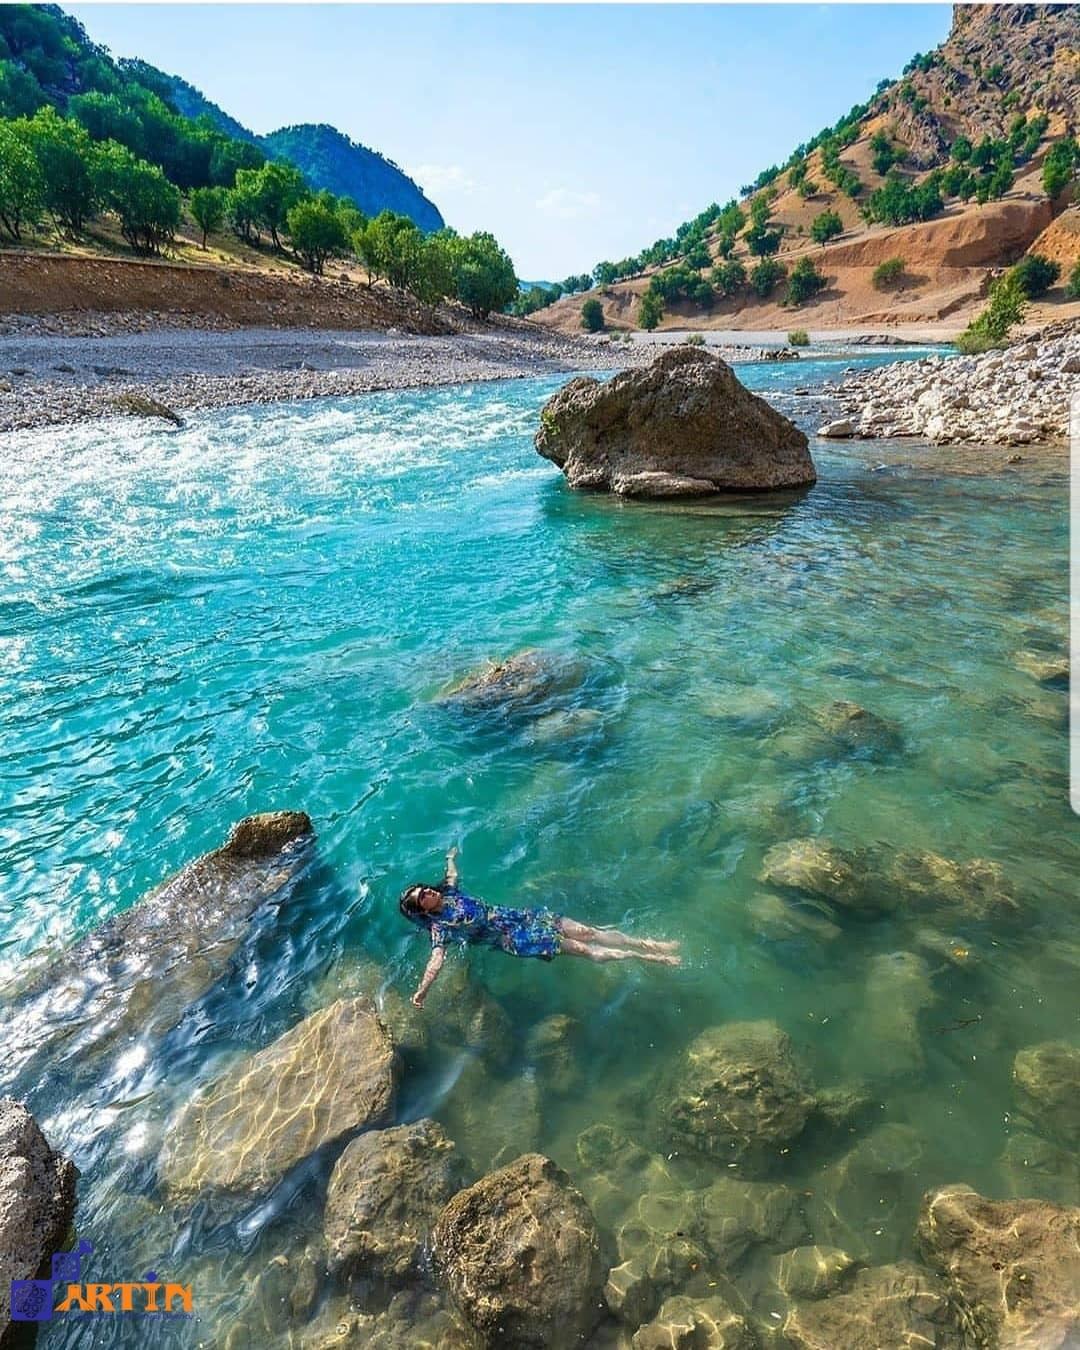 Highest mountains in Iran travelartin.com